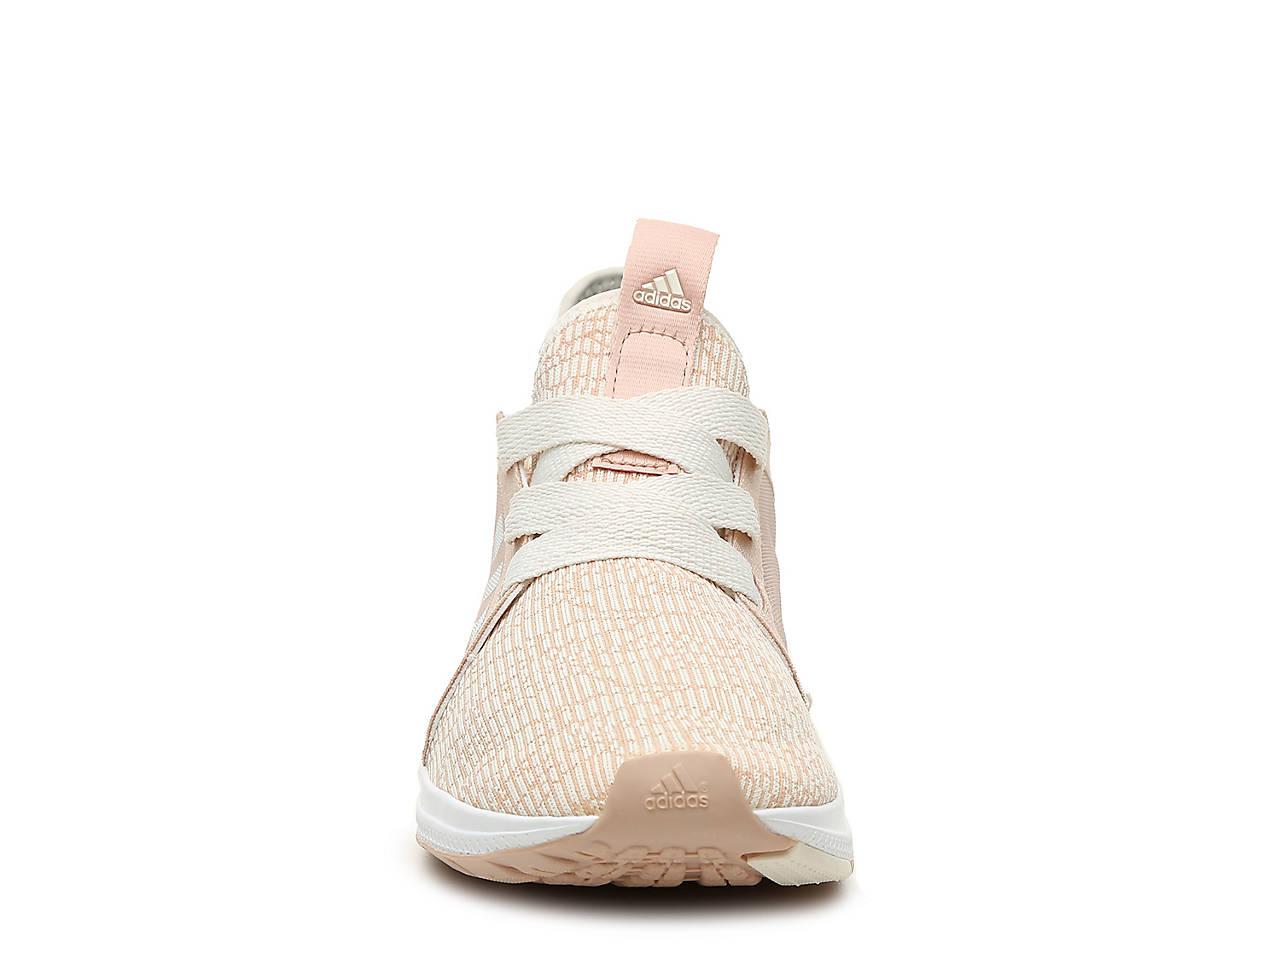 9845b146ec25b adidas Edge Lux Lightweight Running Shoe - Women s Women s Shoes